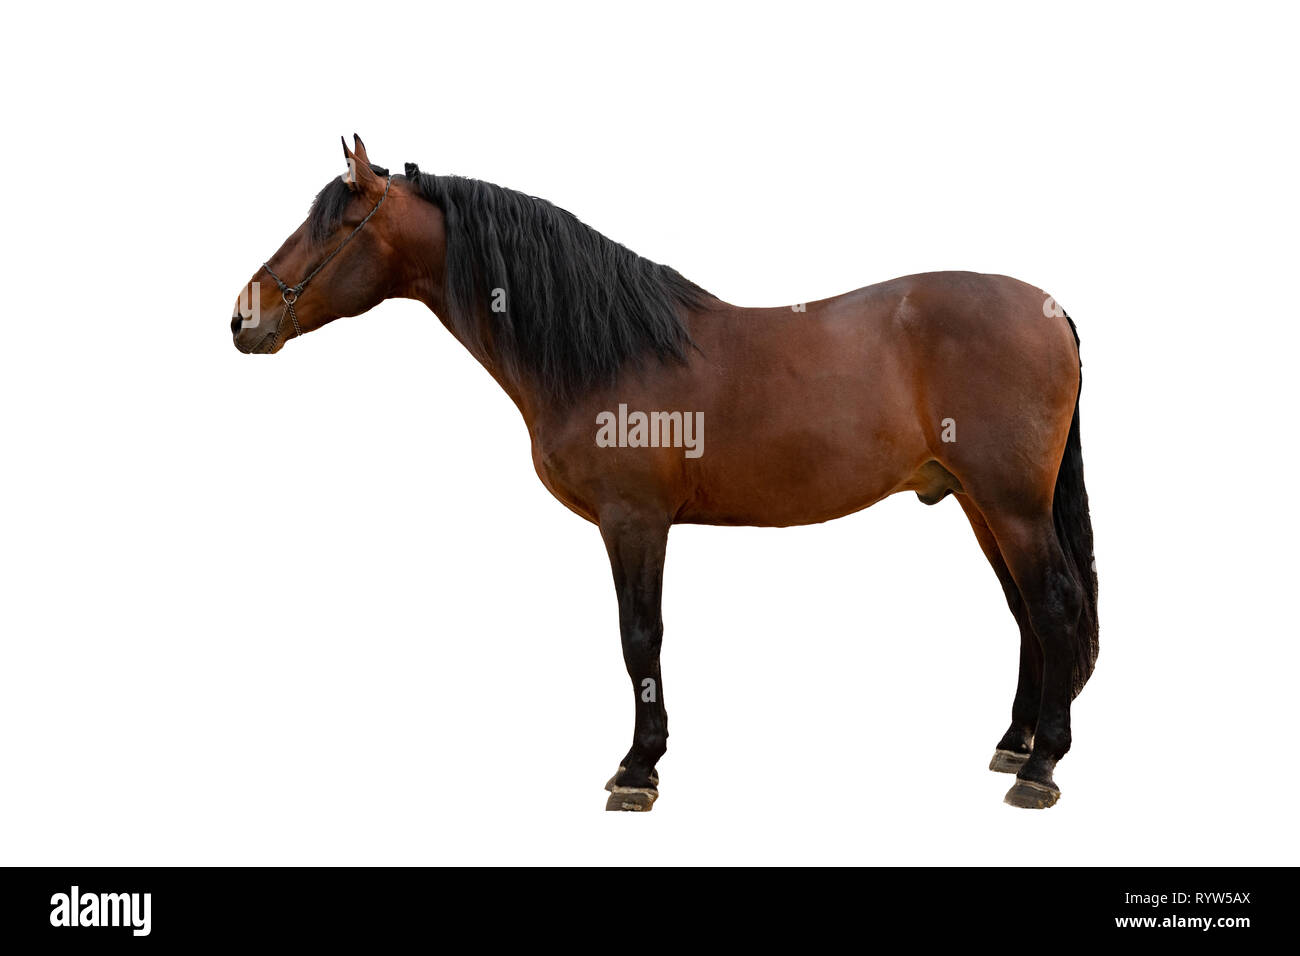 The bay horse isolated on white - Stock Image